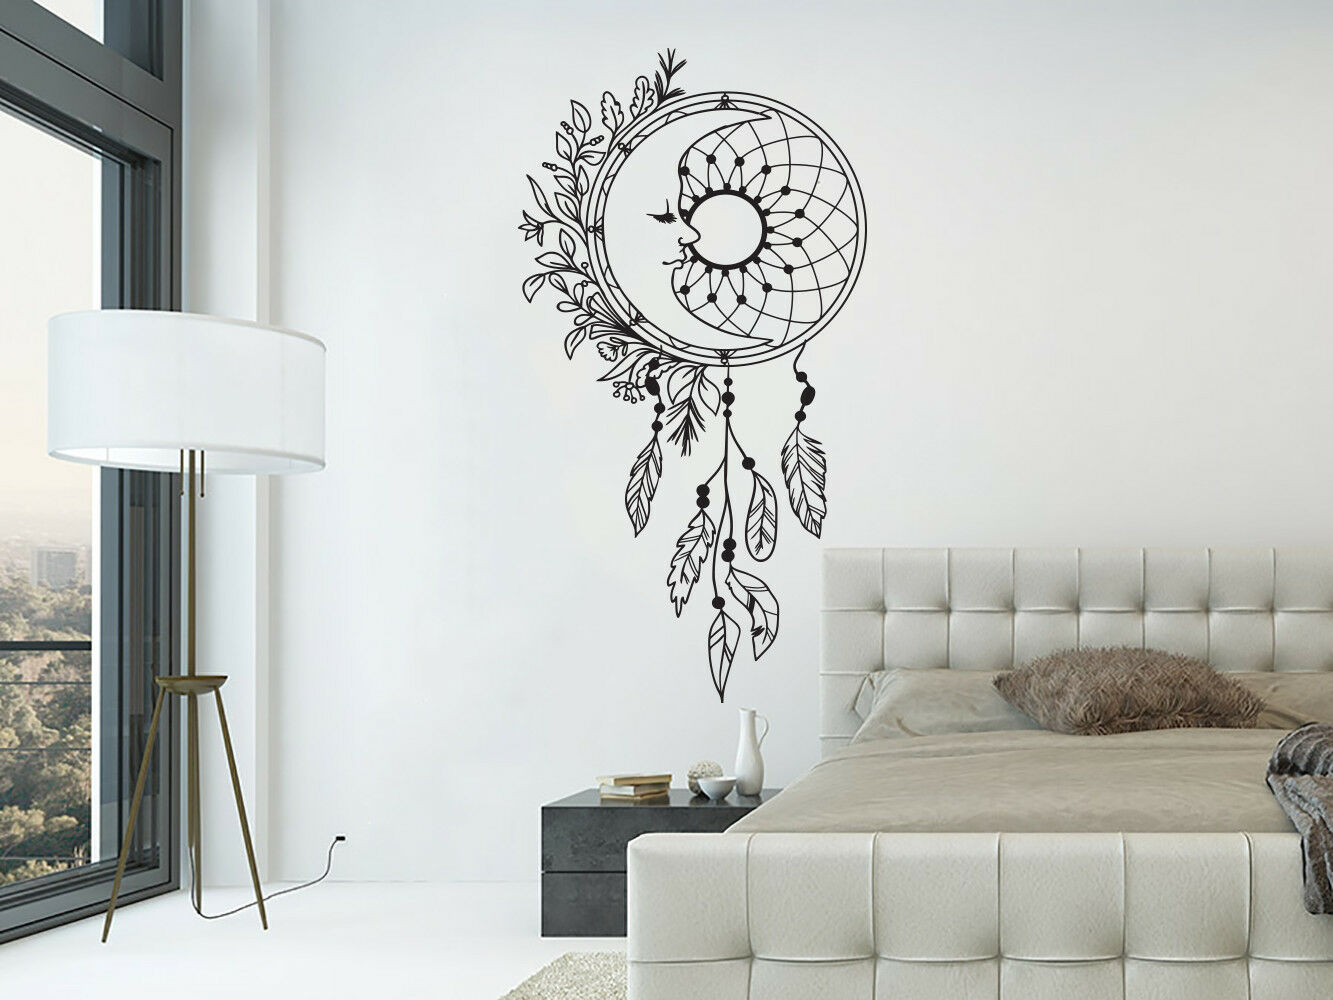 Dream Catcher Wall Decals. Moon Wall Stickers. Boho Bohemian Bedroom Decor NV290